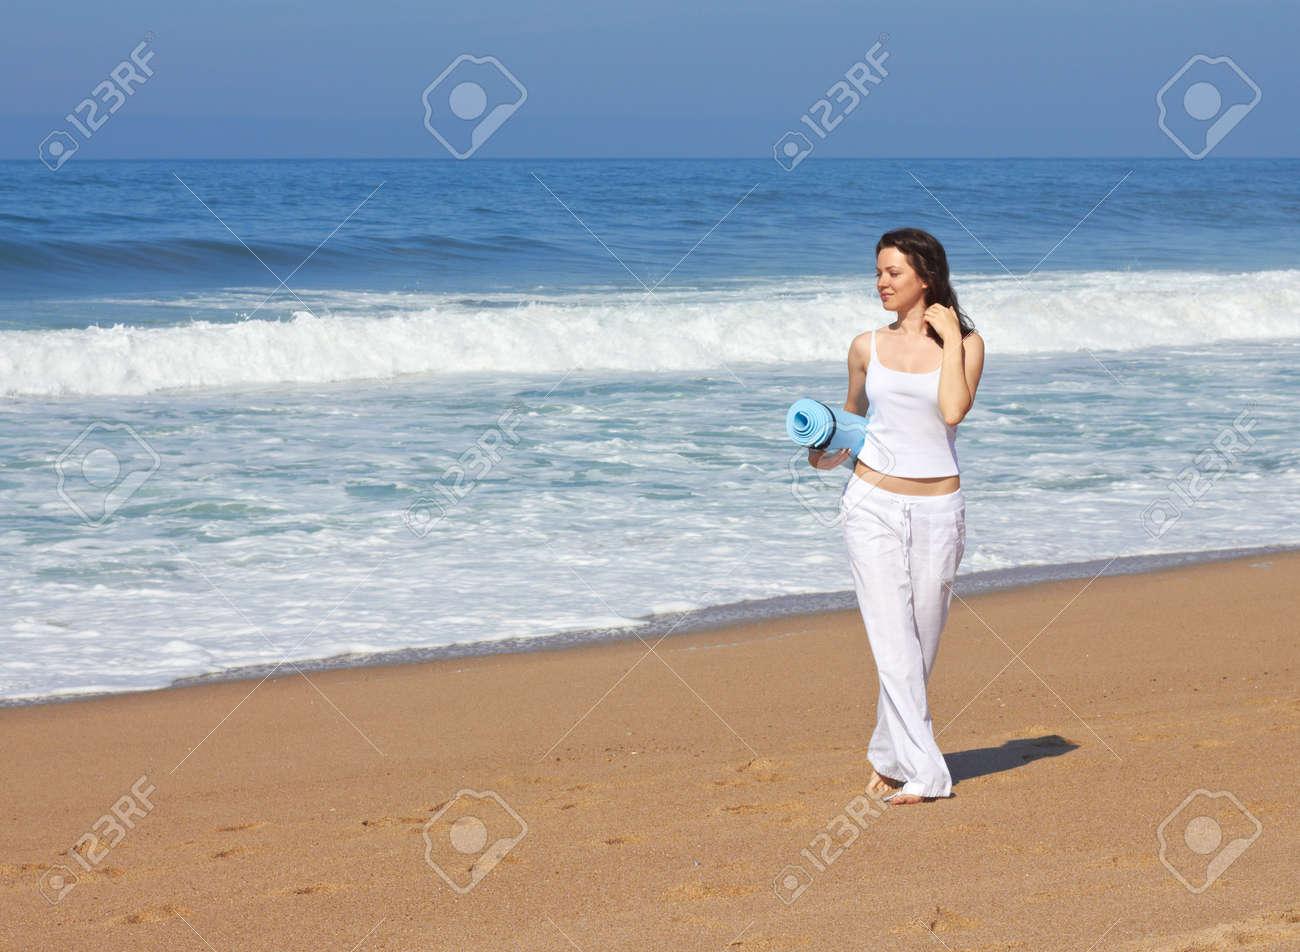 Sport on the beach Stock Photo - 18116866